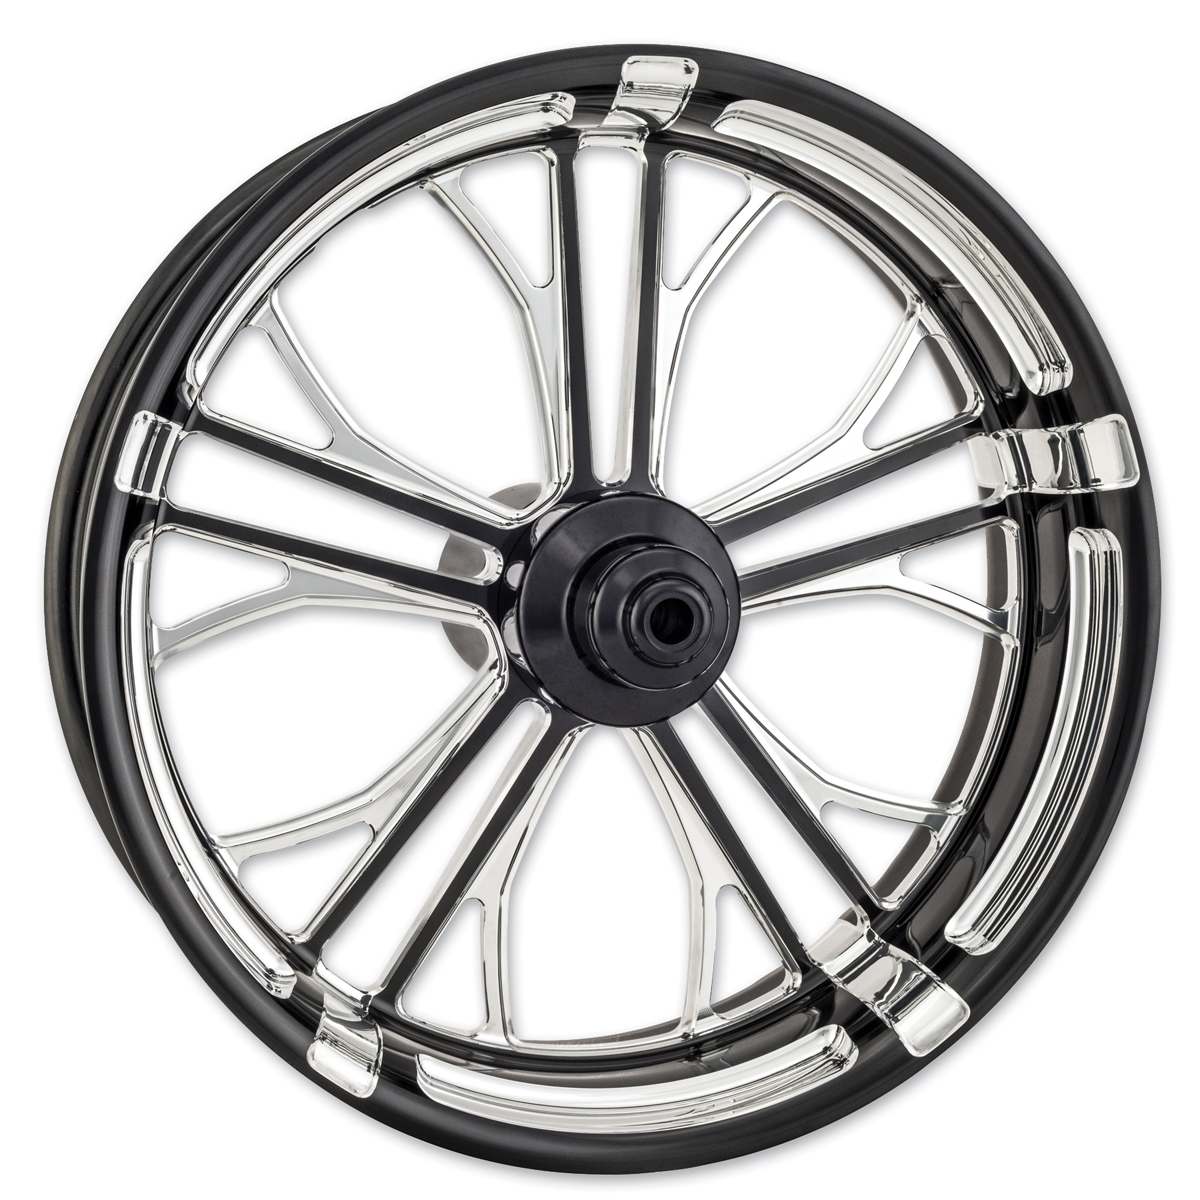 Performance Machine Dixon Platinum Cut Front Wheel 21x2.15 ABS